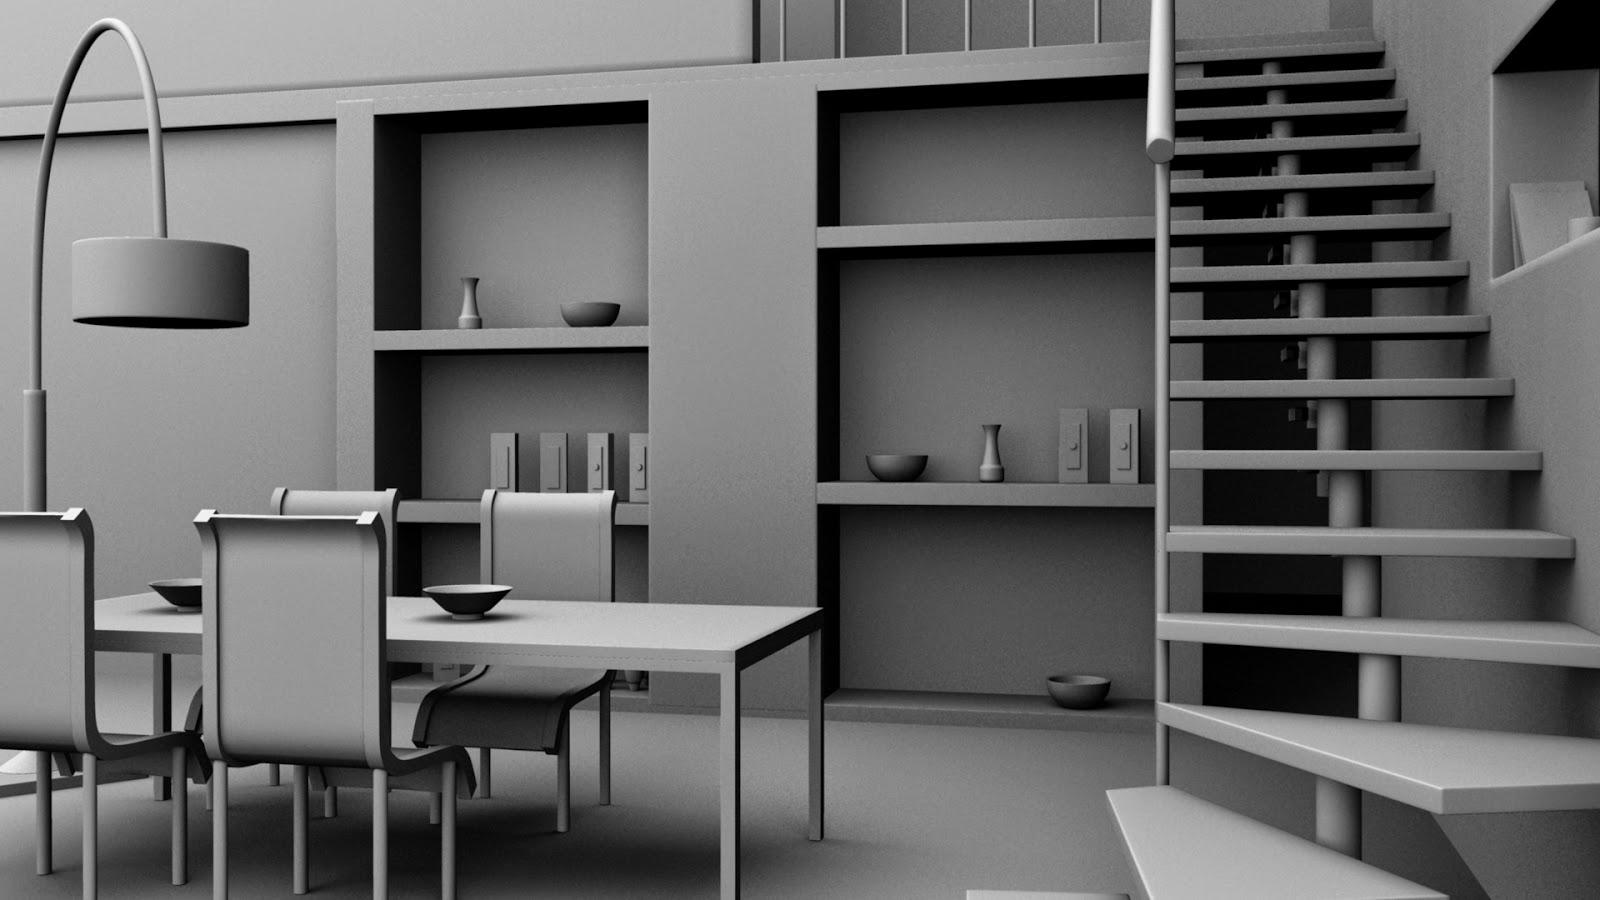 3d models in autodesk maya interior dining area